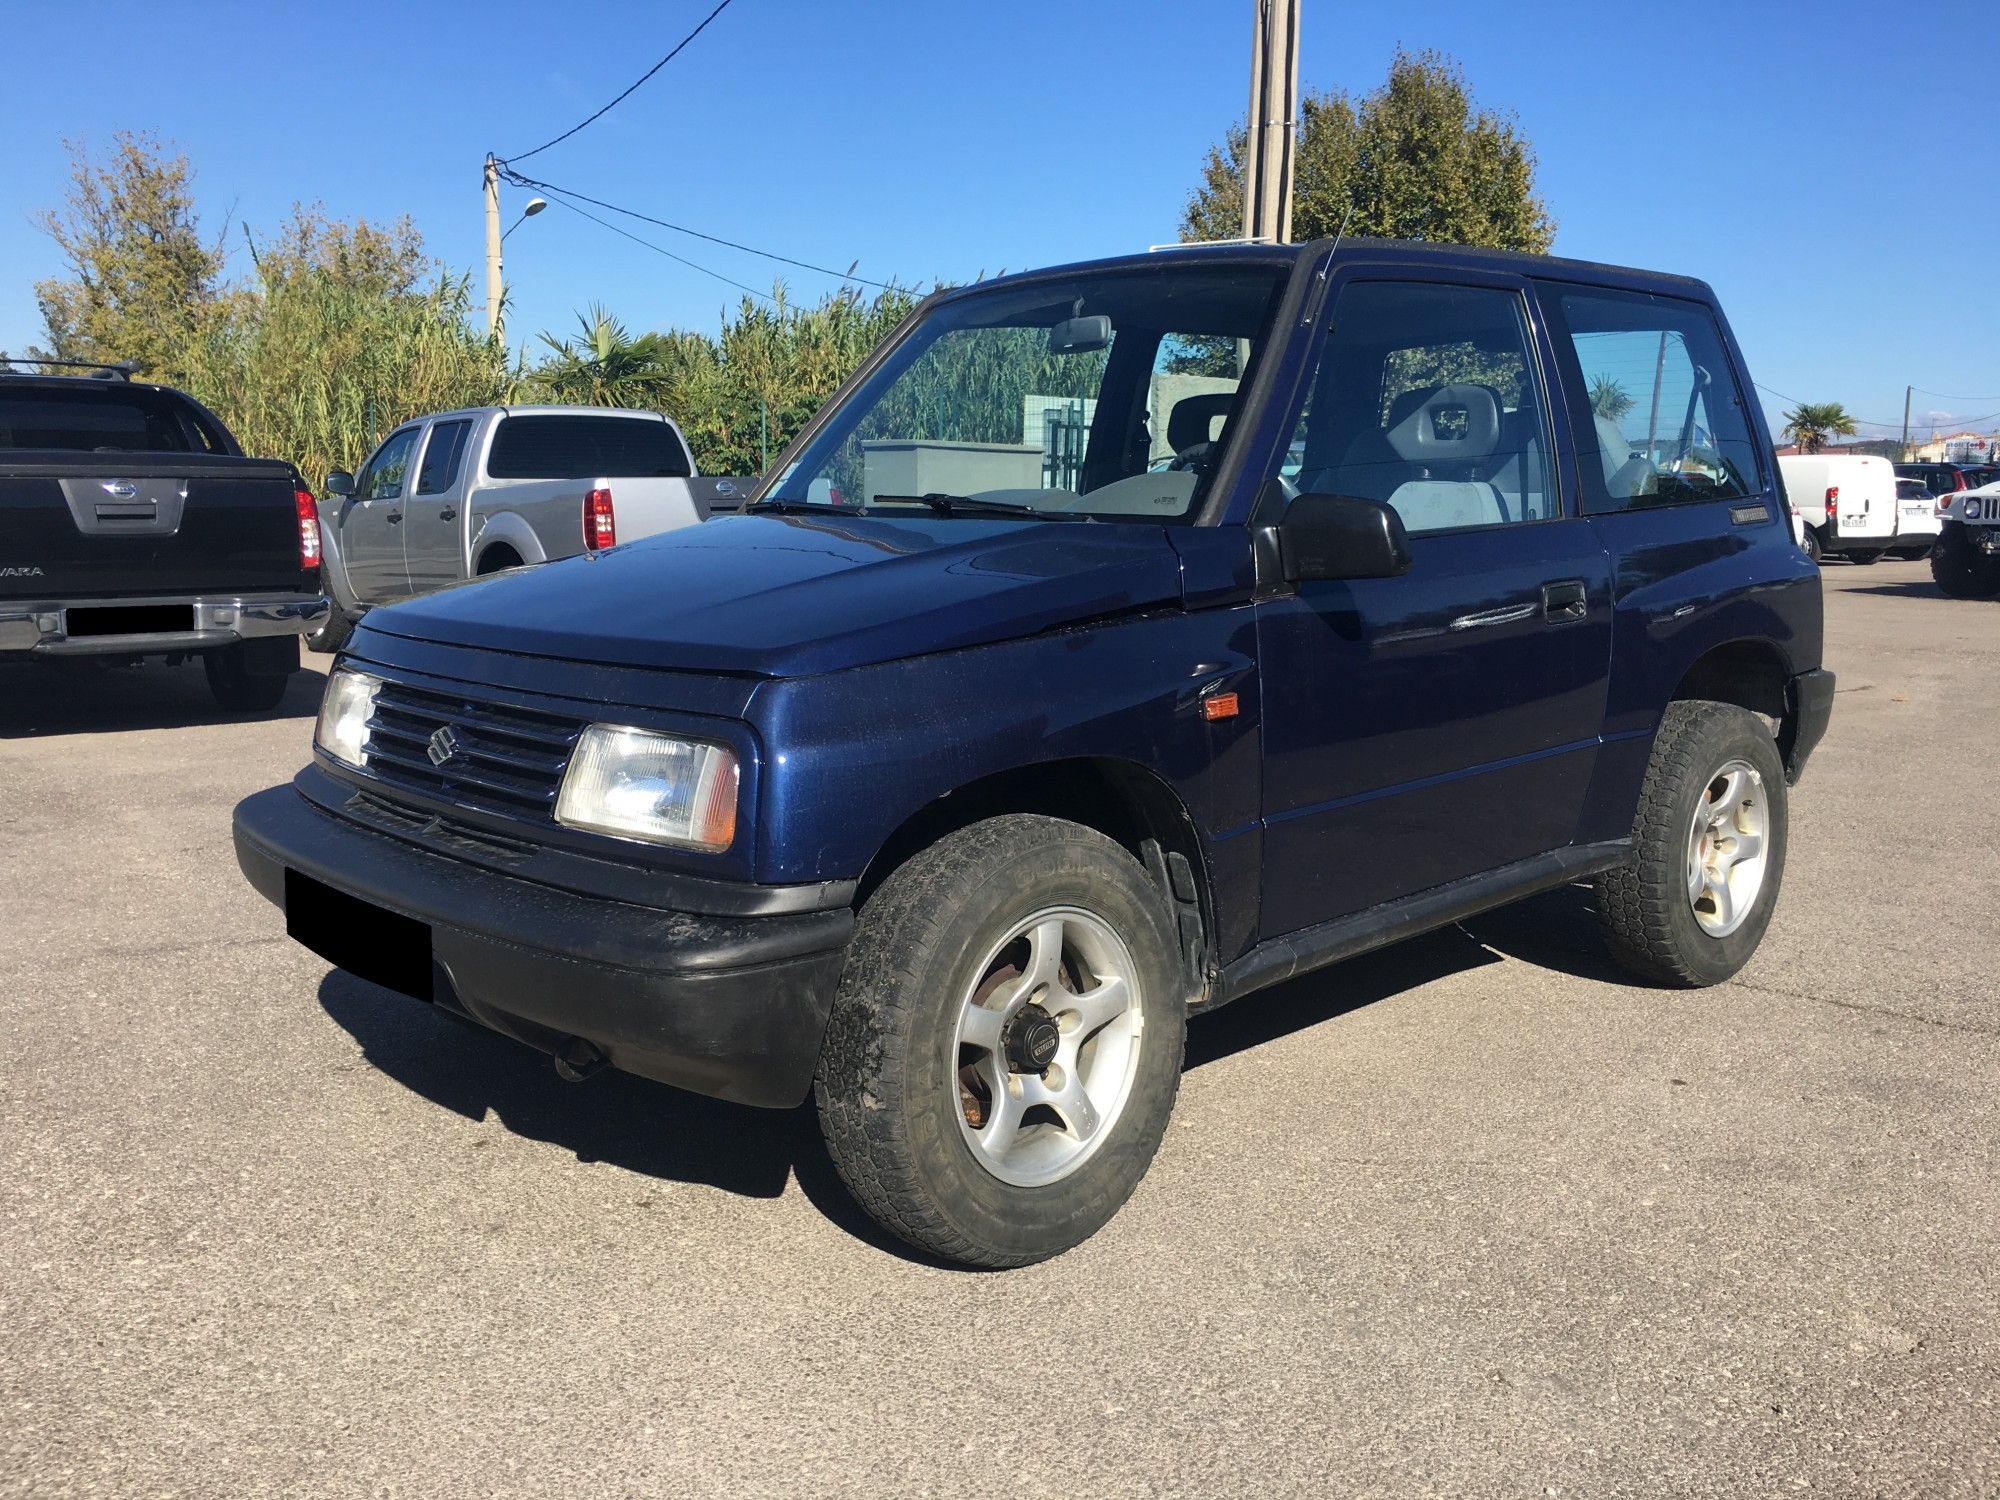 Suzuki vitara 2.0 HDi 90 ch 2004 - pro fun 4x4